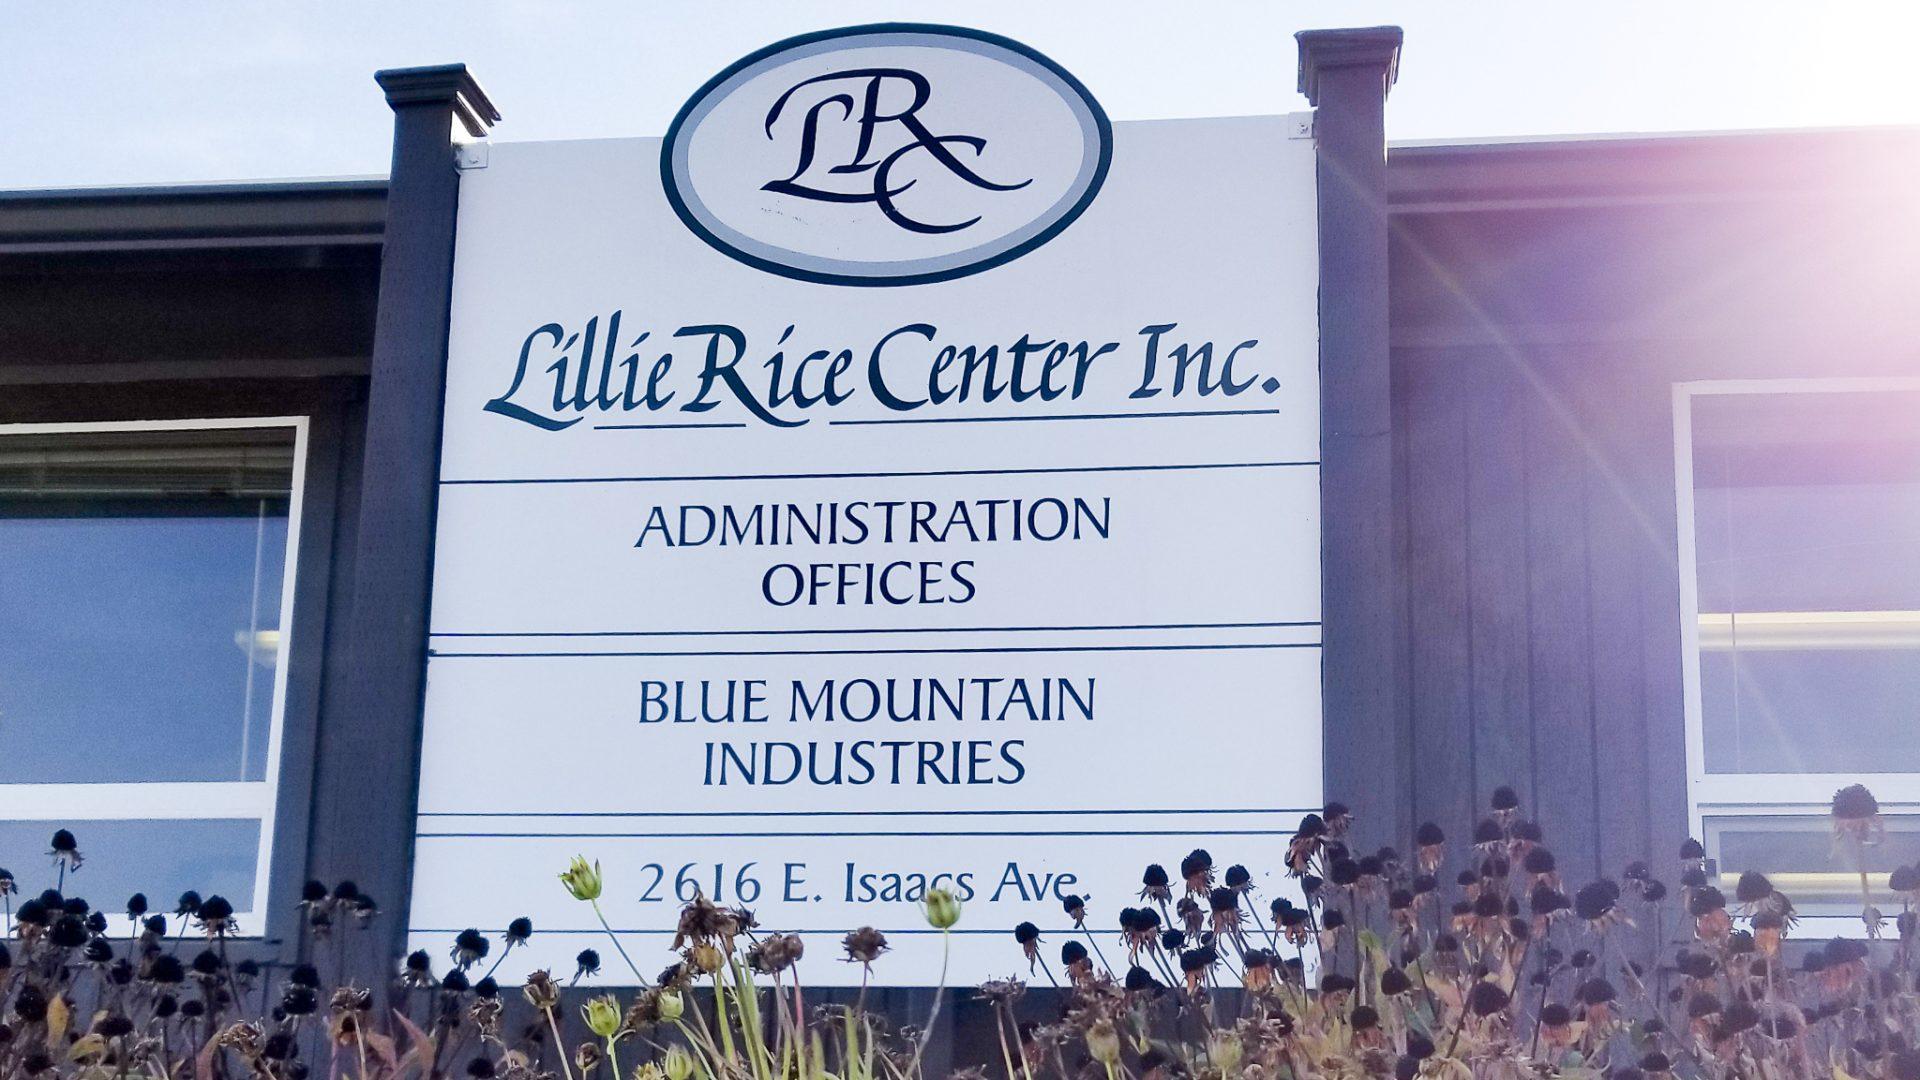 Blue Mountain Industries